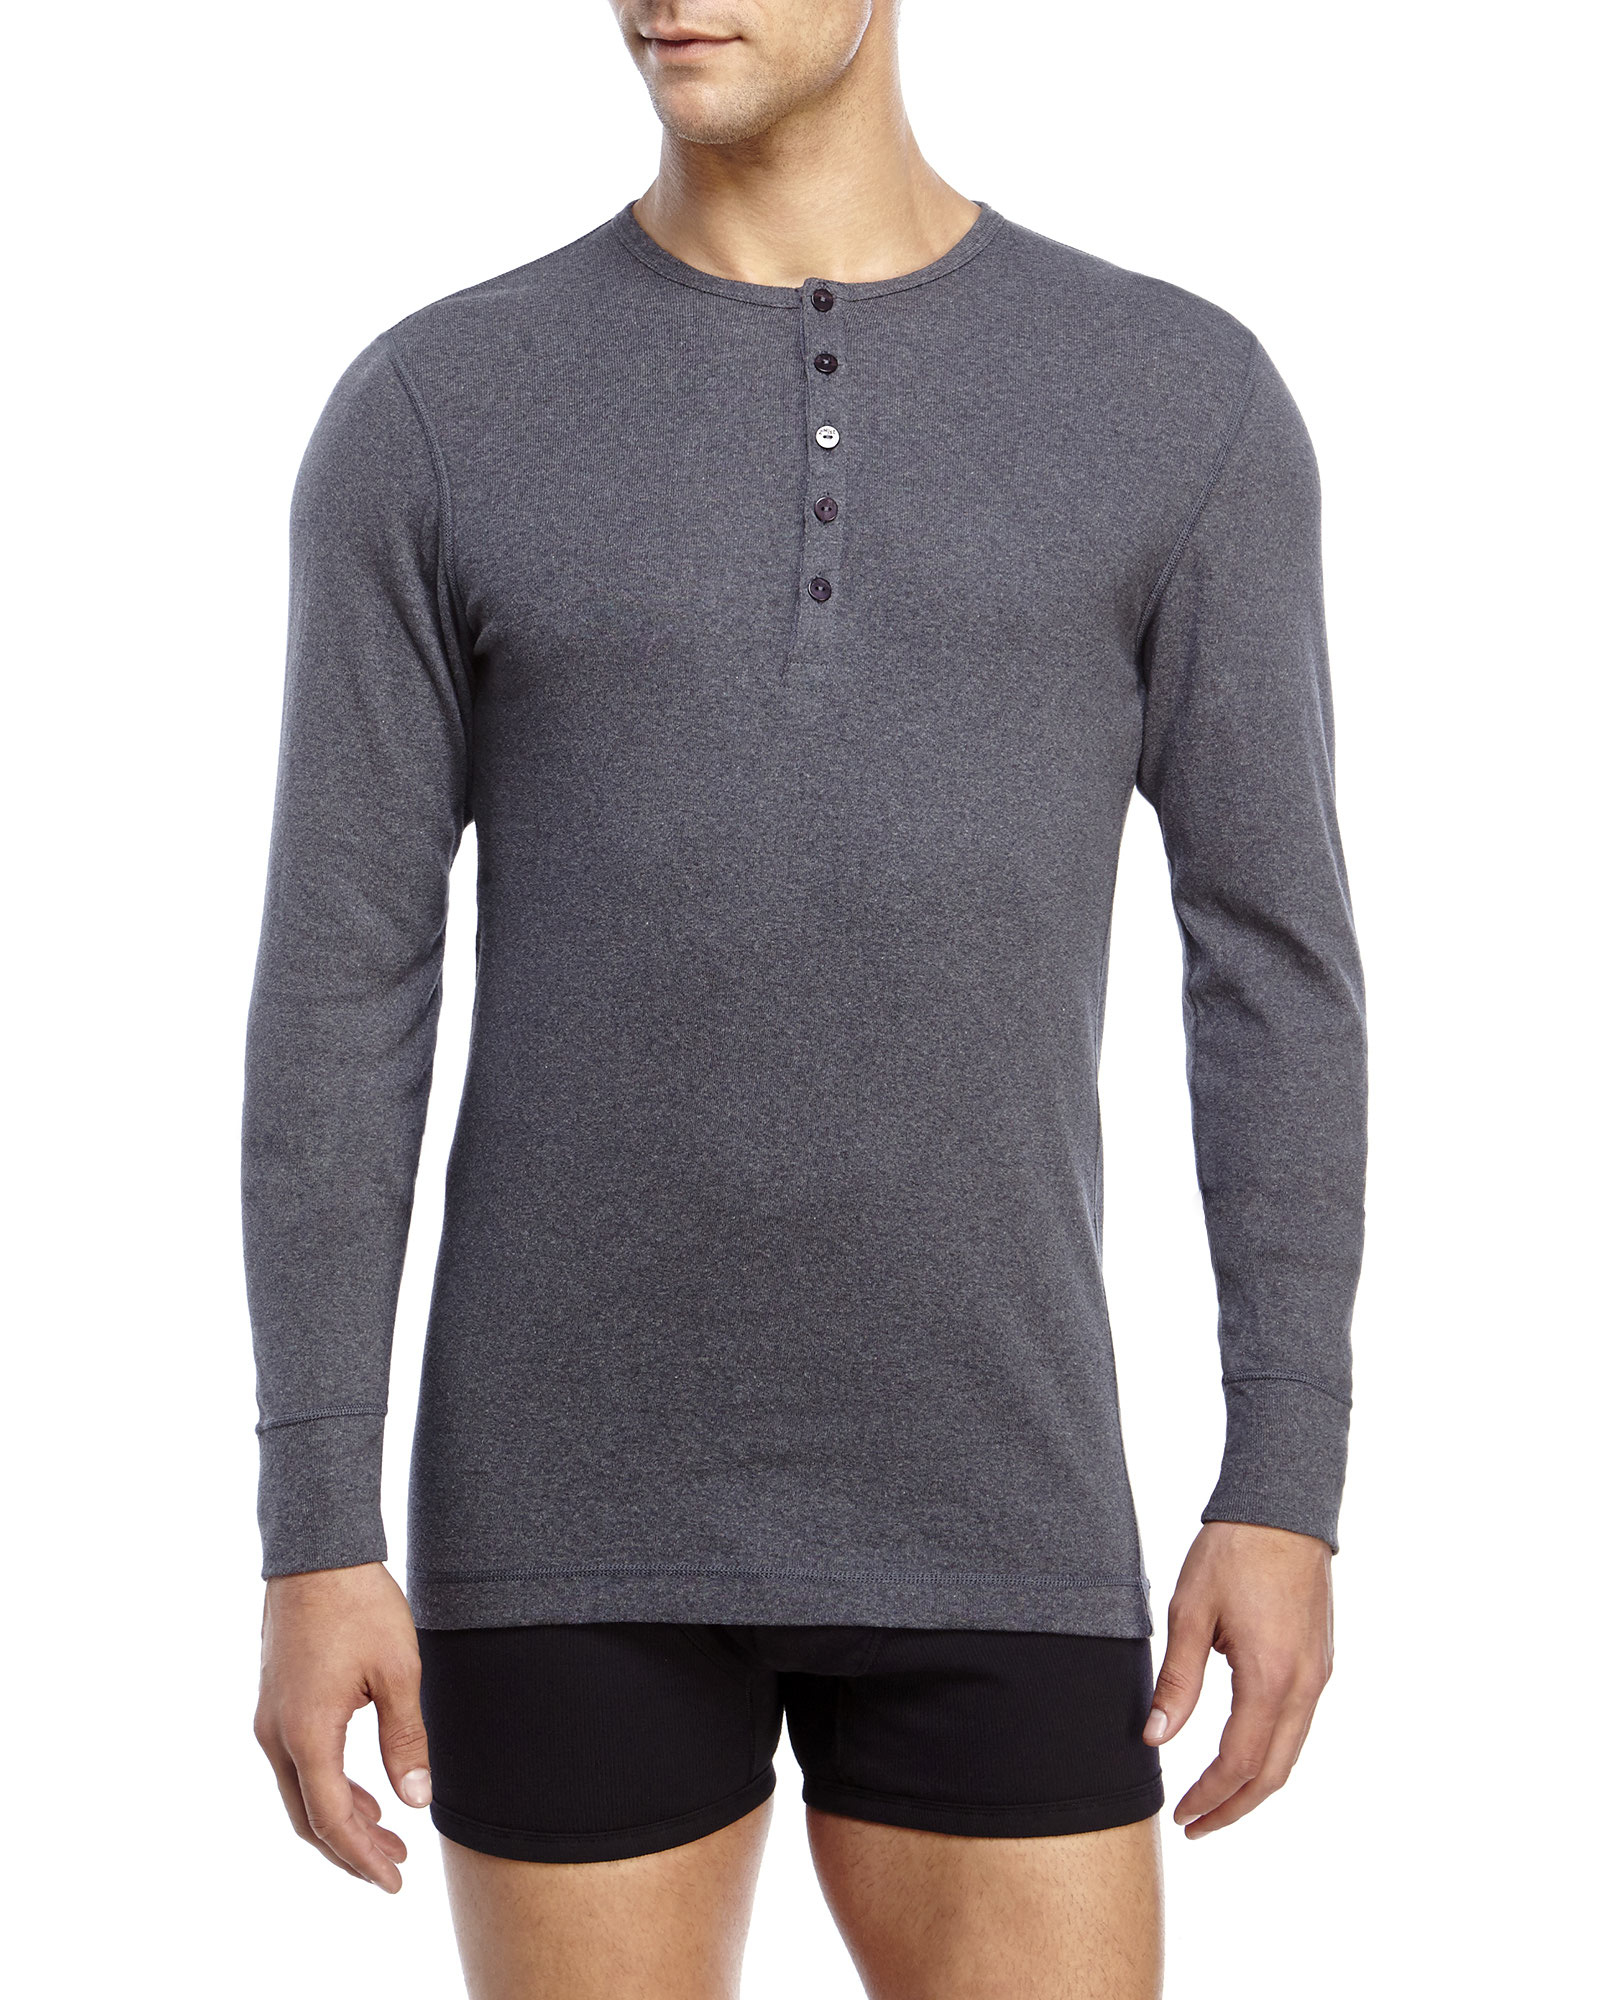 7b3105b8 2xist 2(X)Ist Essential Long Sleeve Henley in Gray for Men - Lyst